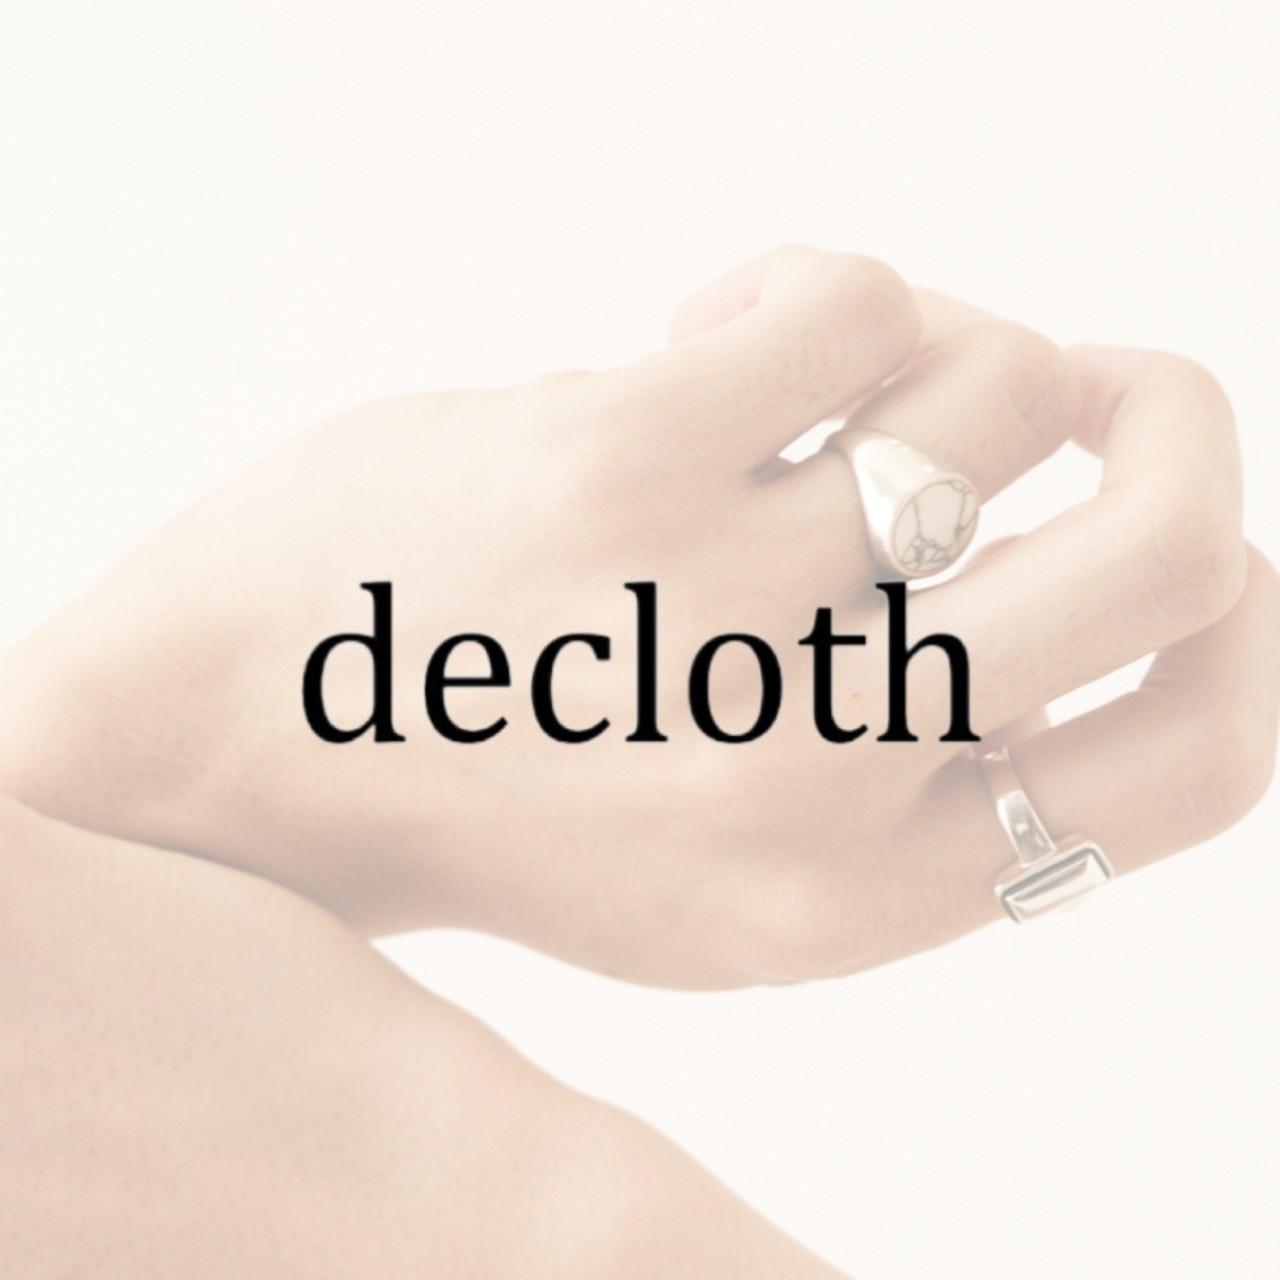 decloth